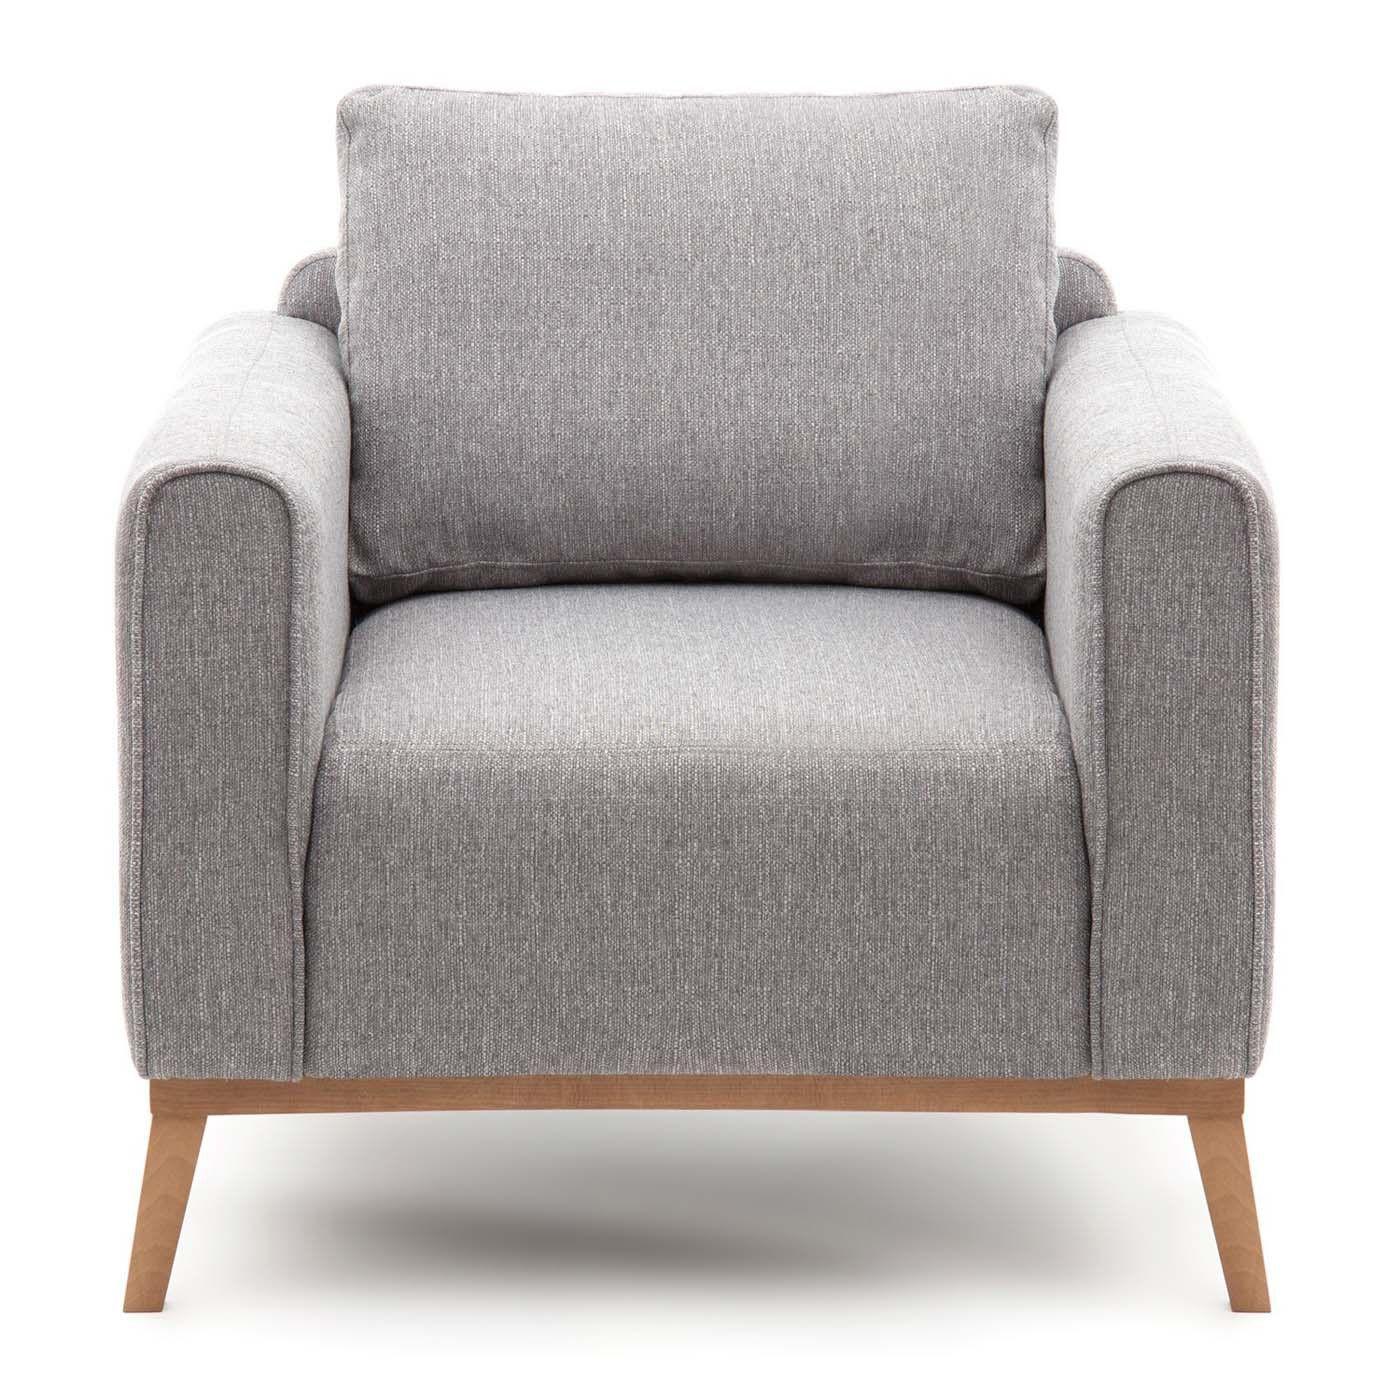 Fotel Na Nóżkach Szary Styl Skandynawski Fotele Sofy I